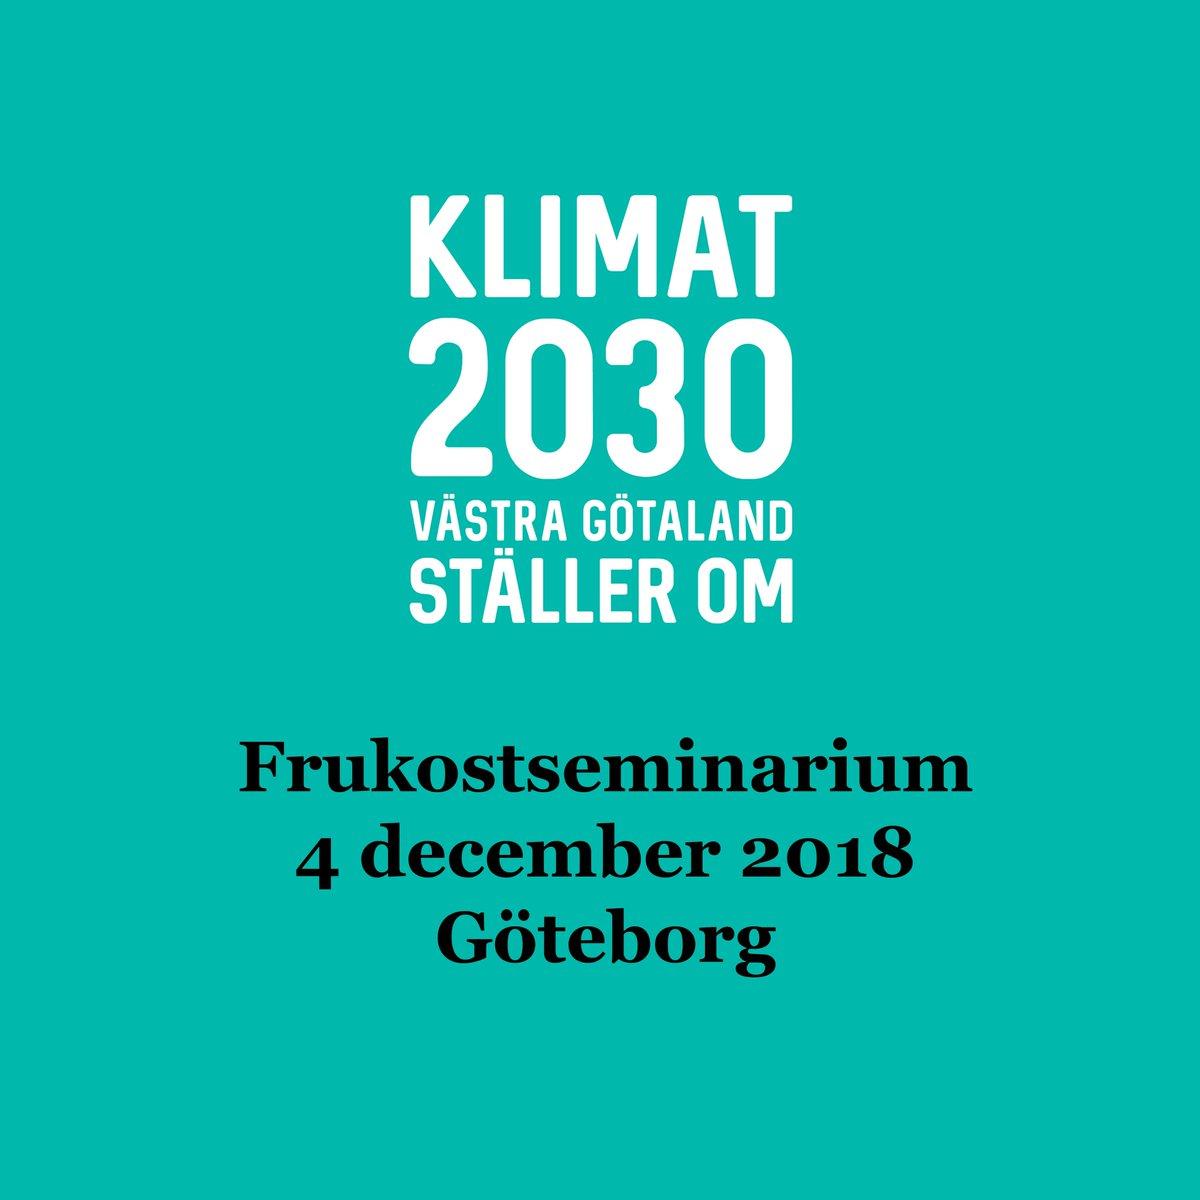 Klimat 2030 On Twitter Save The Date Klimat 2030s årliga